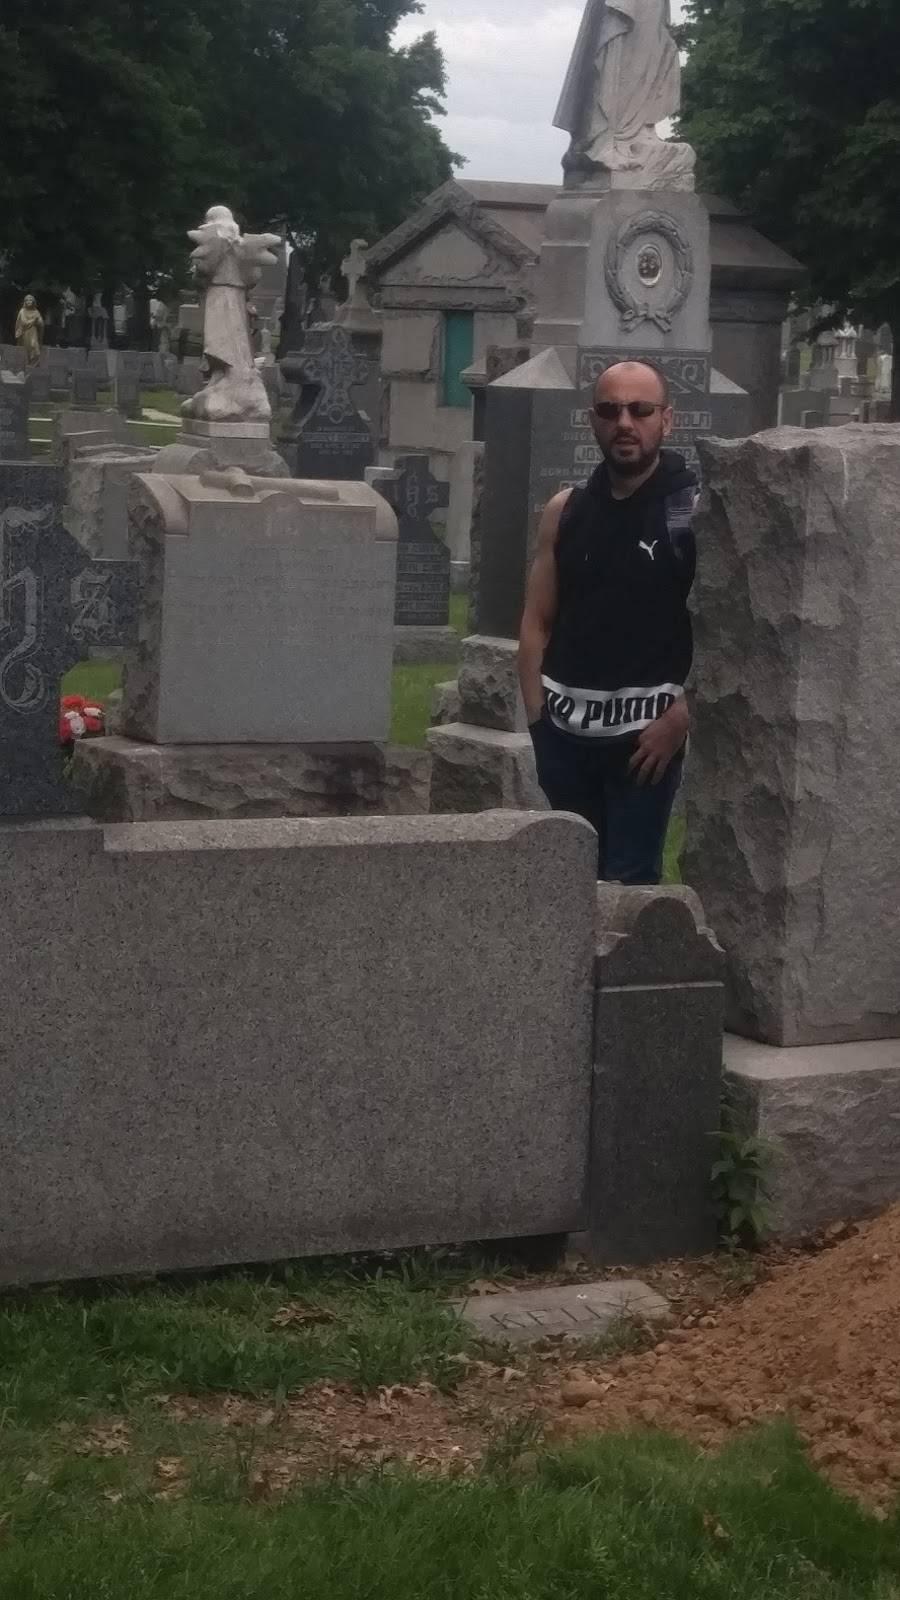 Historic Jersey City and Harsimus Cemetery - cemetery  | Photo 7 of 9 | Address: 435 Newark Ave, Jersey City, NJ 07302, USA | Phone: (201) 707-0738